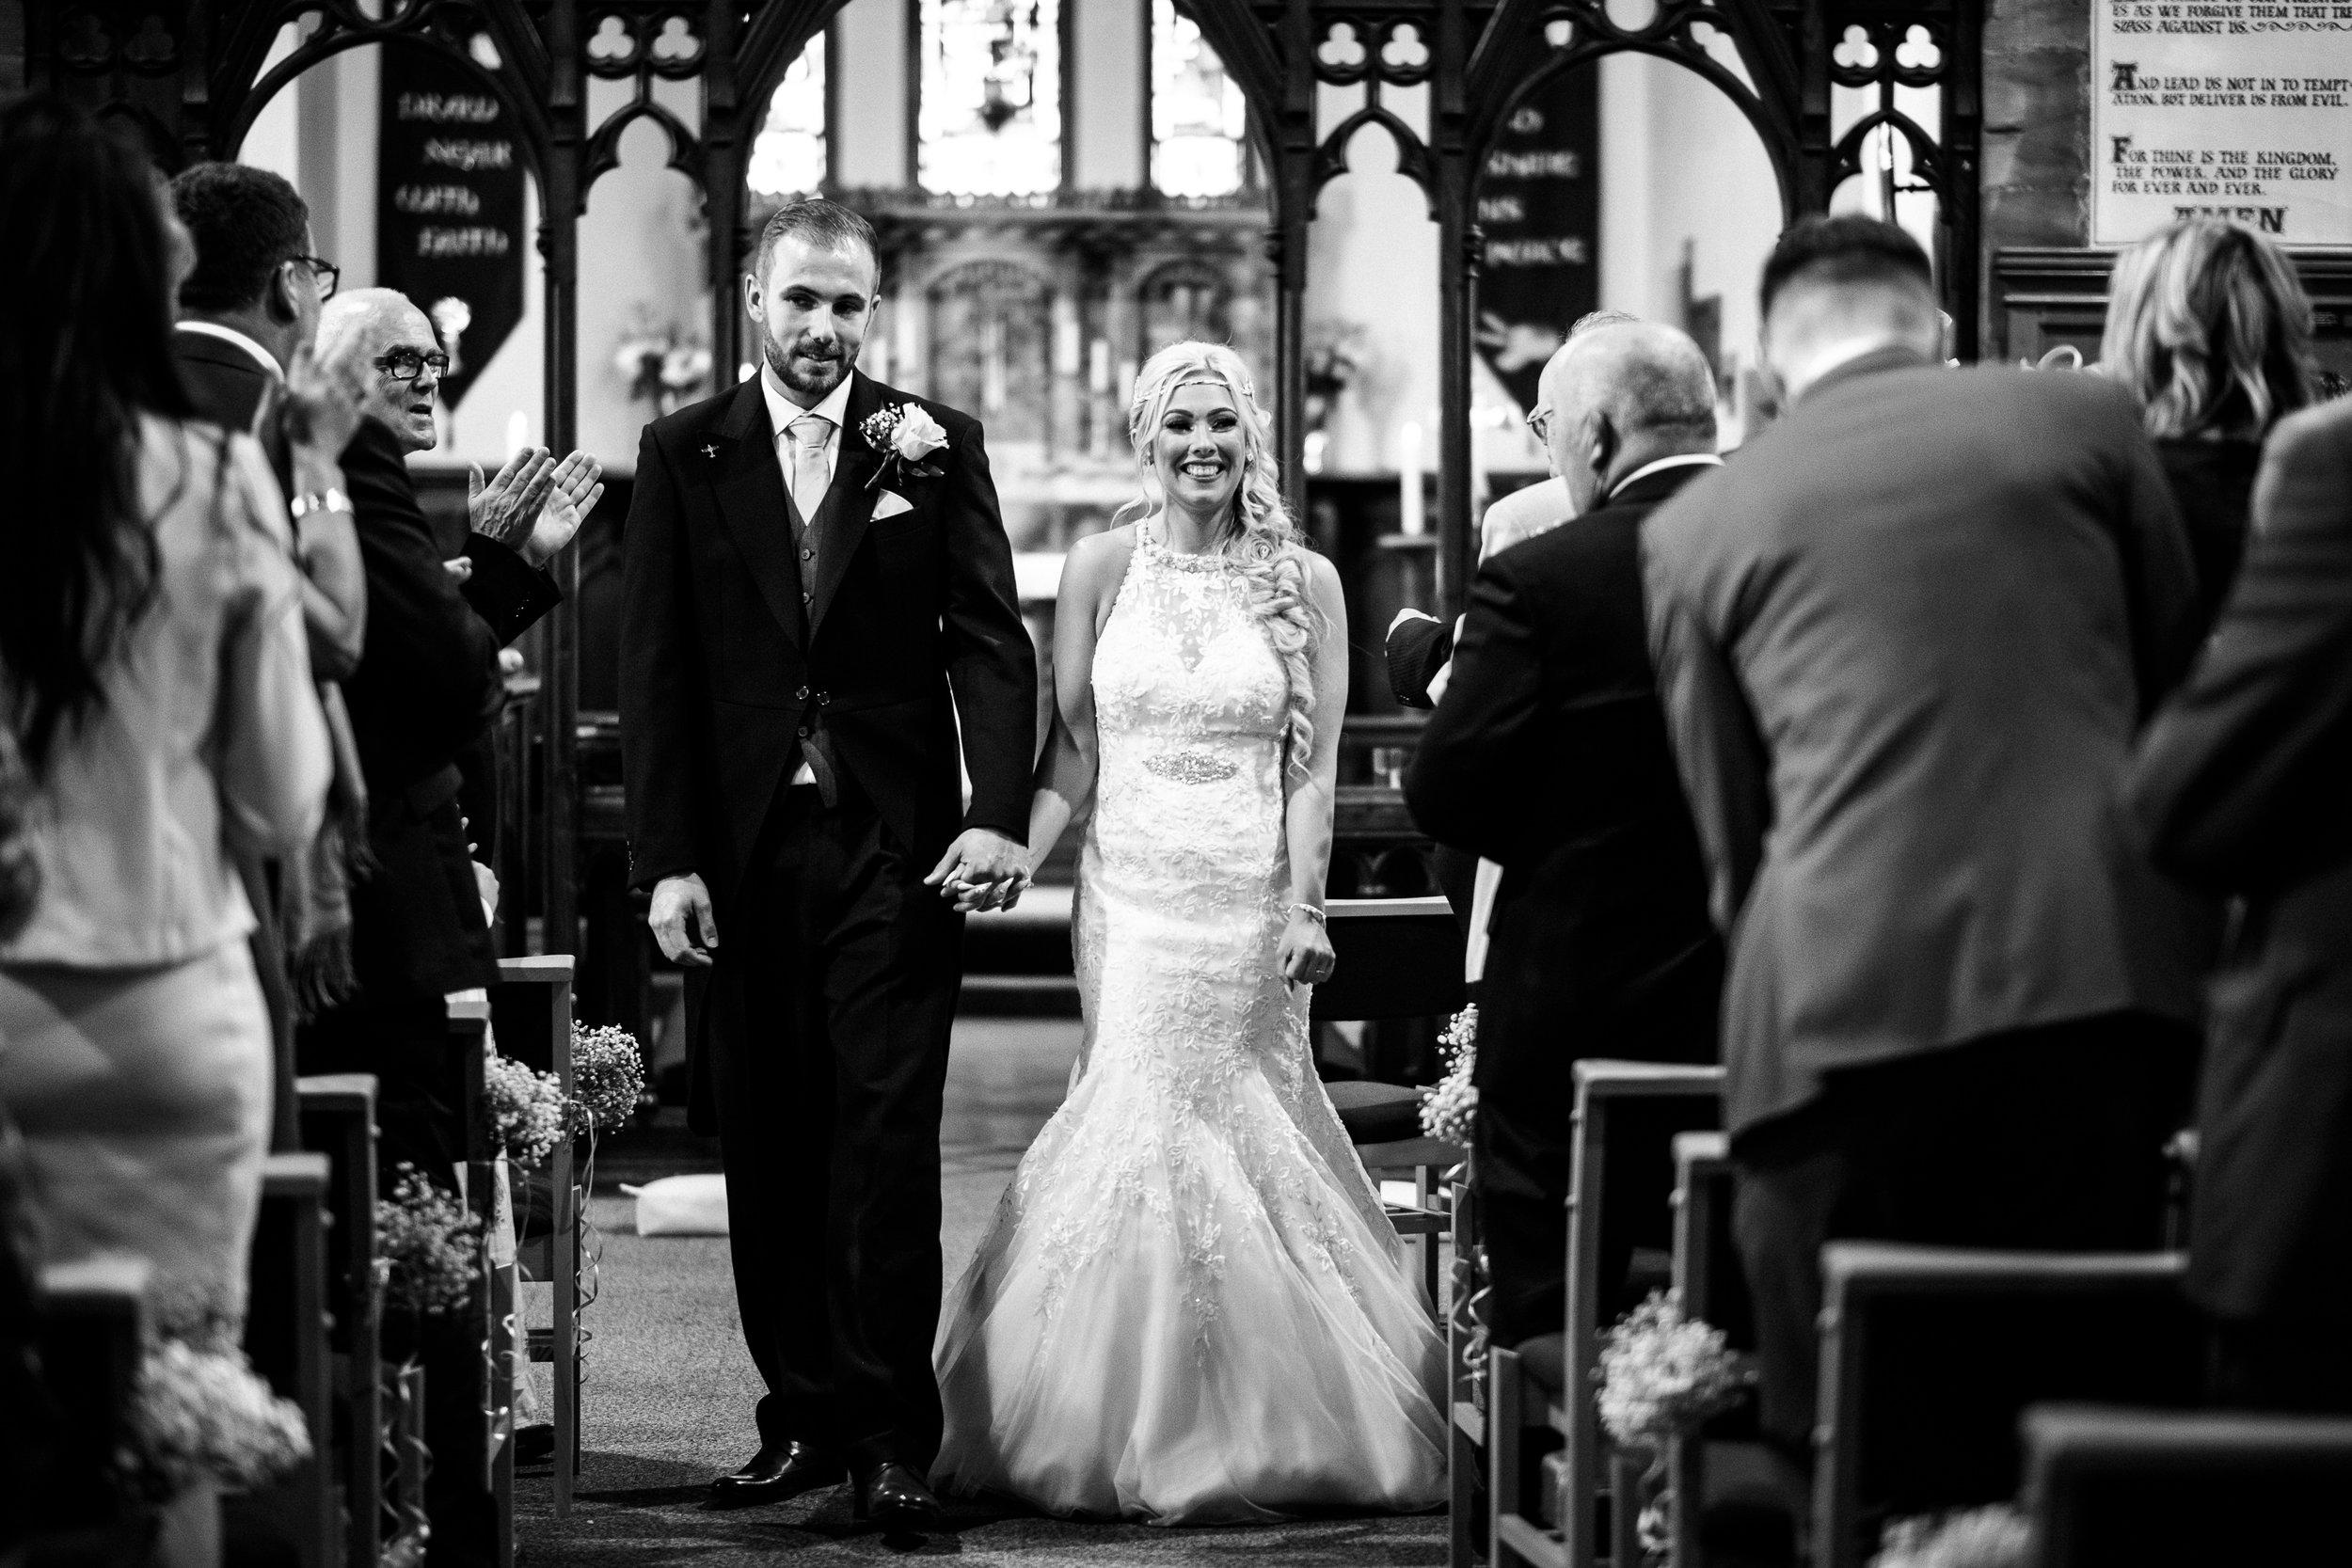 Summer Documentary Wedding Photography Floral Hall, Stoke-on-Trent, Staffordshire - Jenny Harper-27.jpg